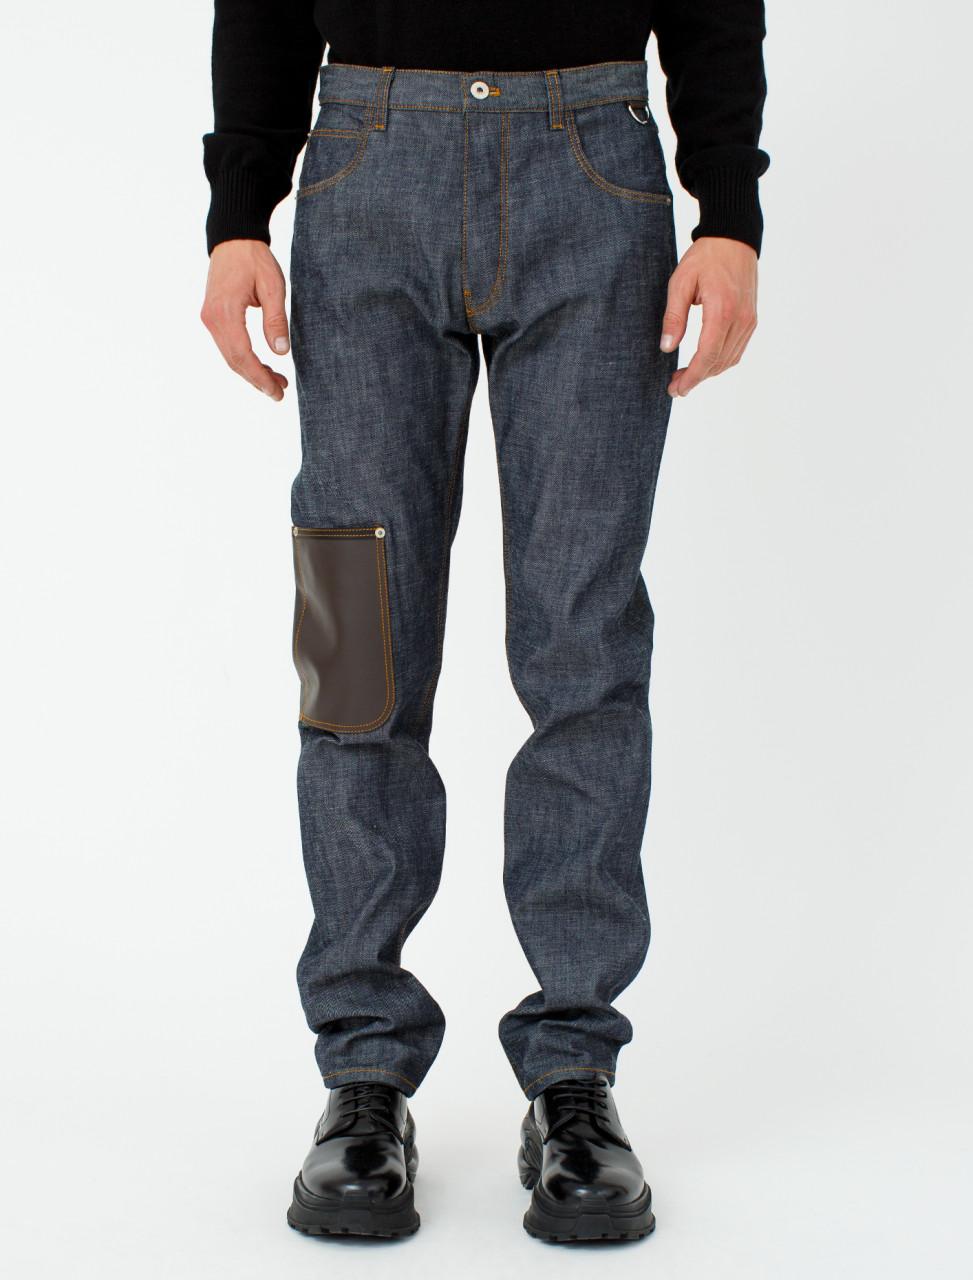 Leather Patch Pocket Jeans